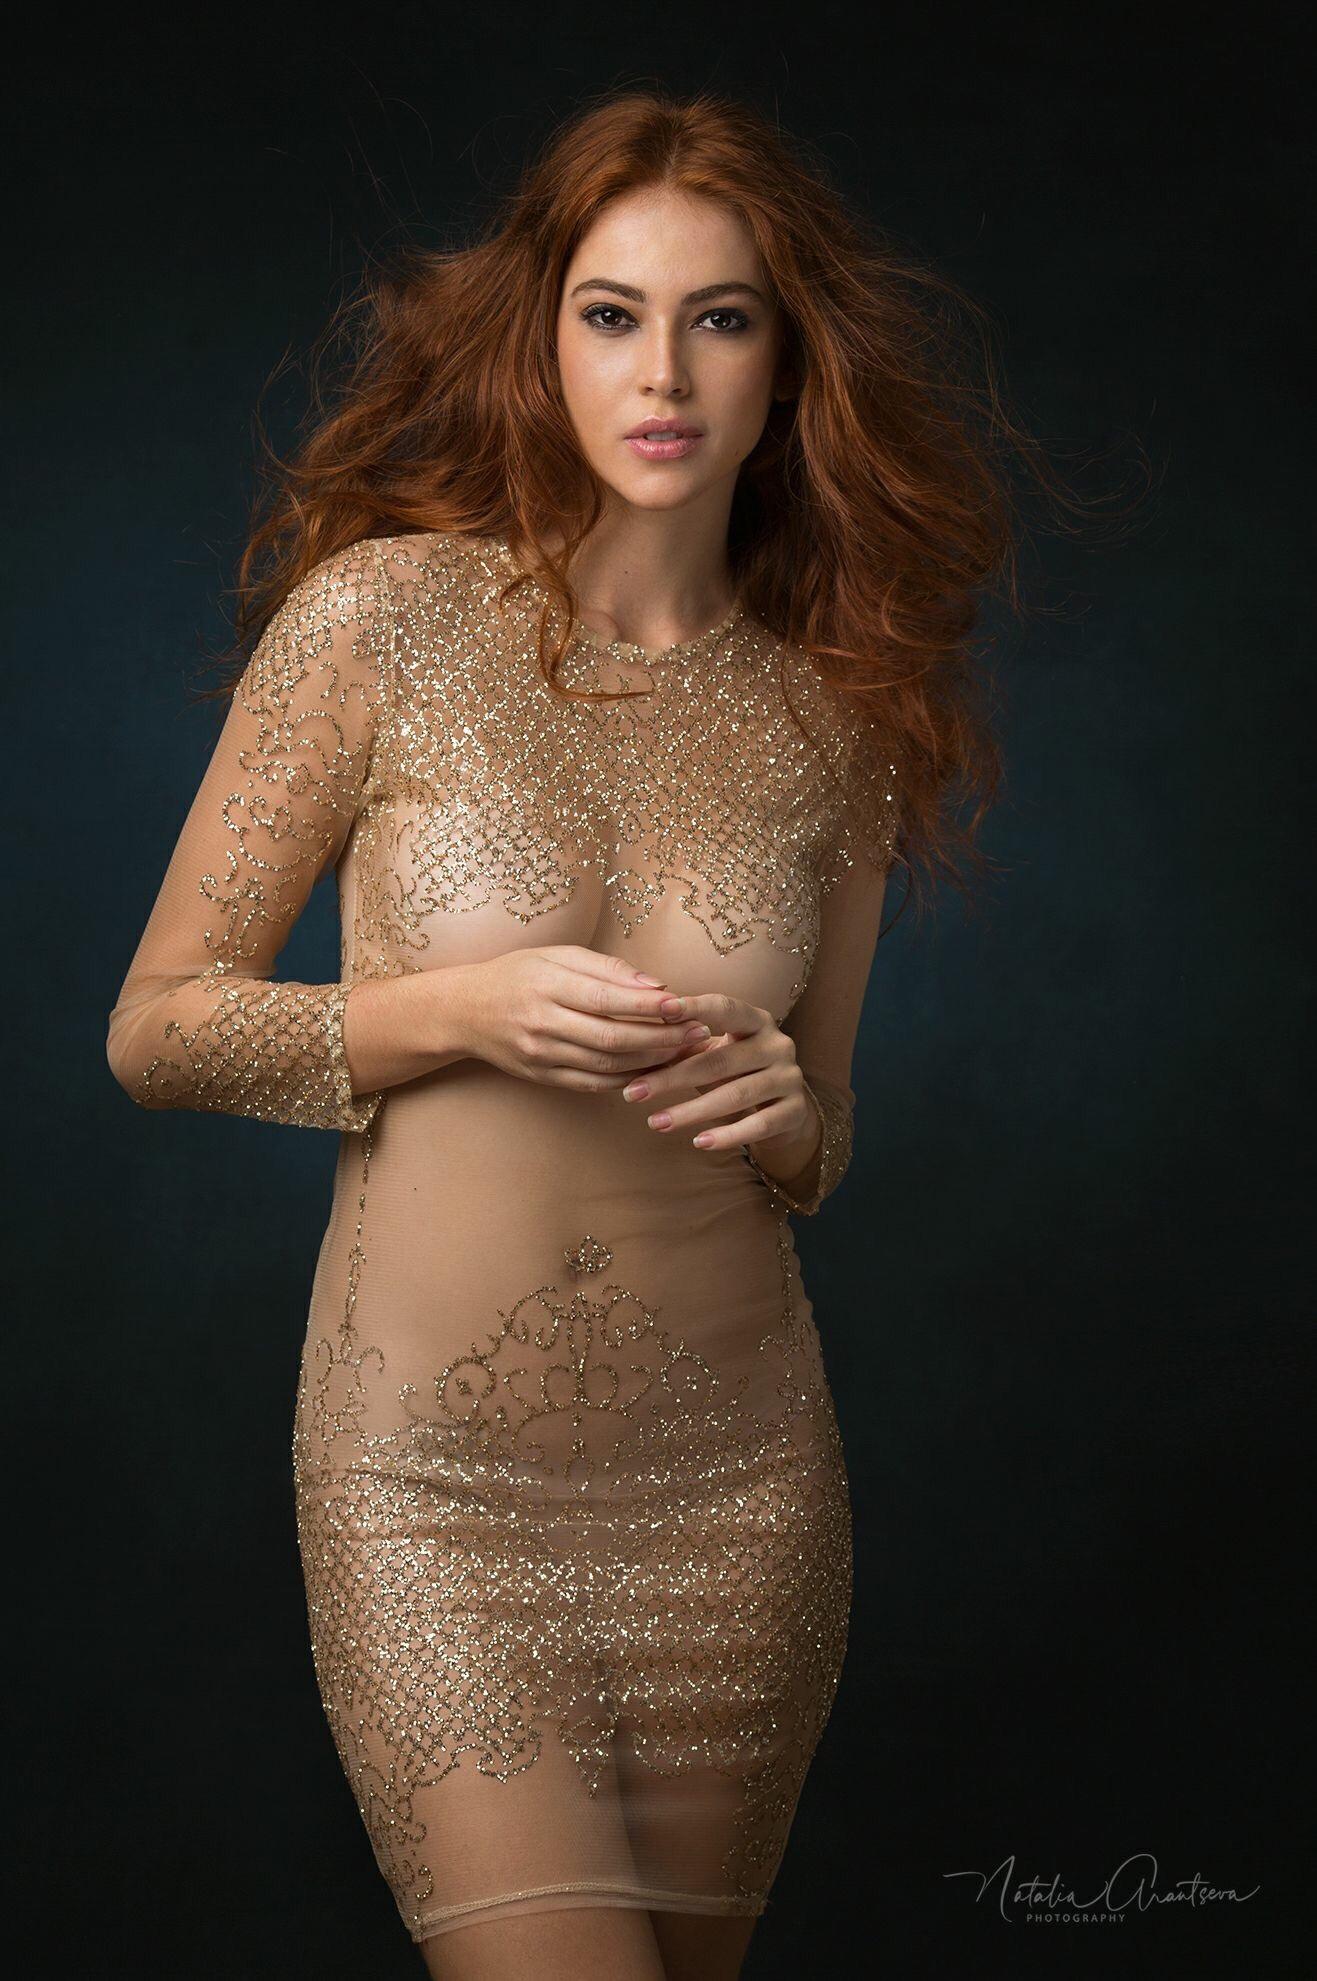 Natalia Arantseva